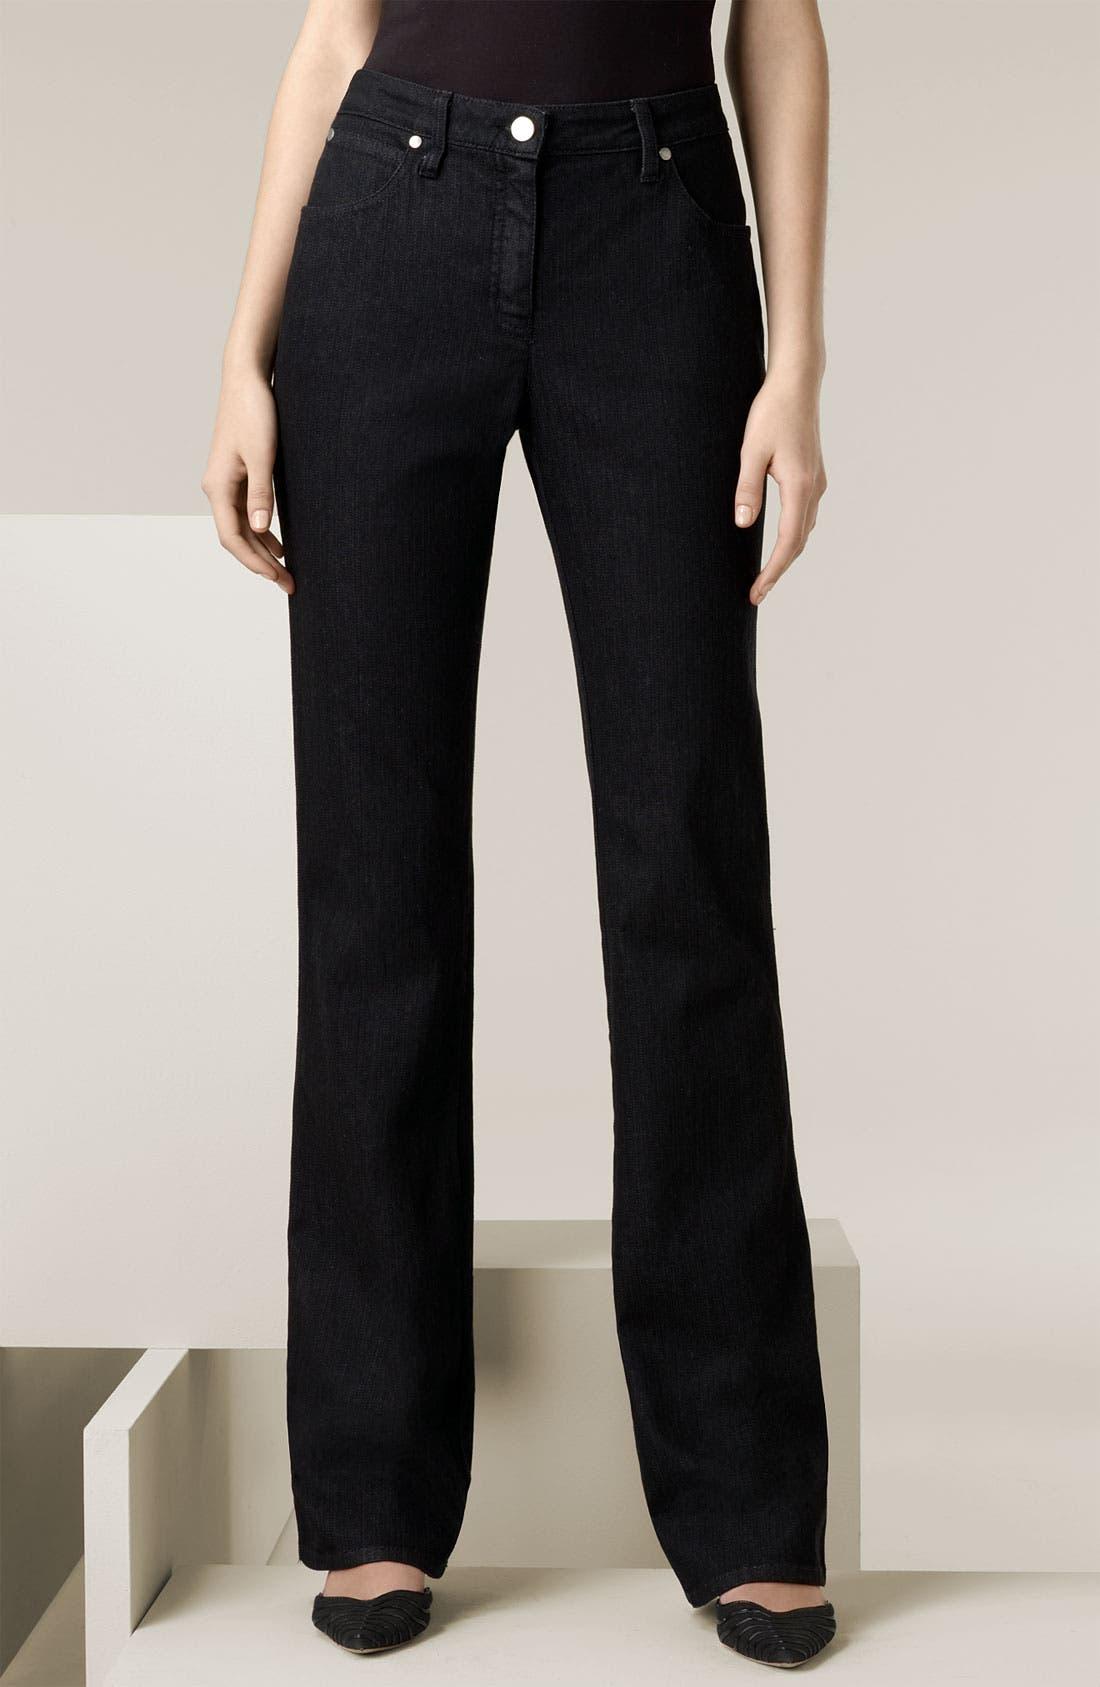 Main Image - Armani Collezioni Classic Stretch Denim Jeans